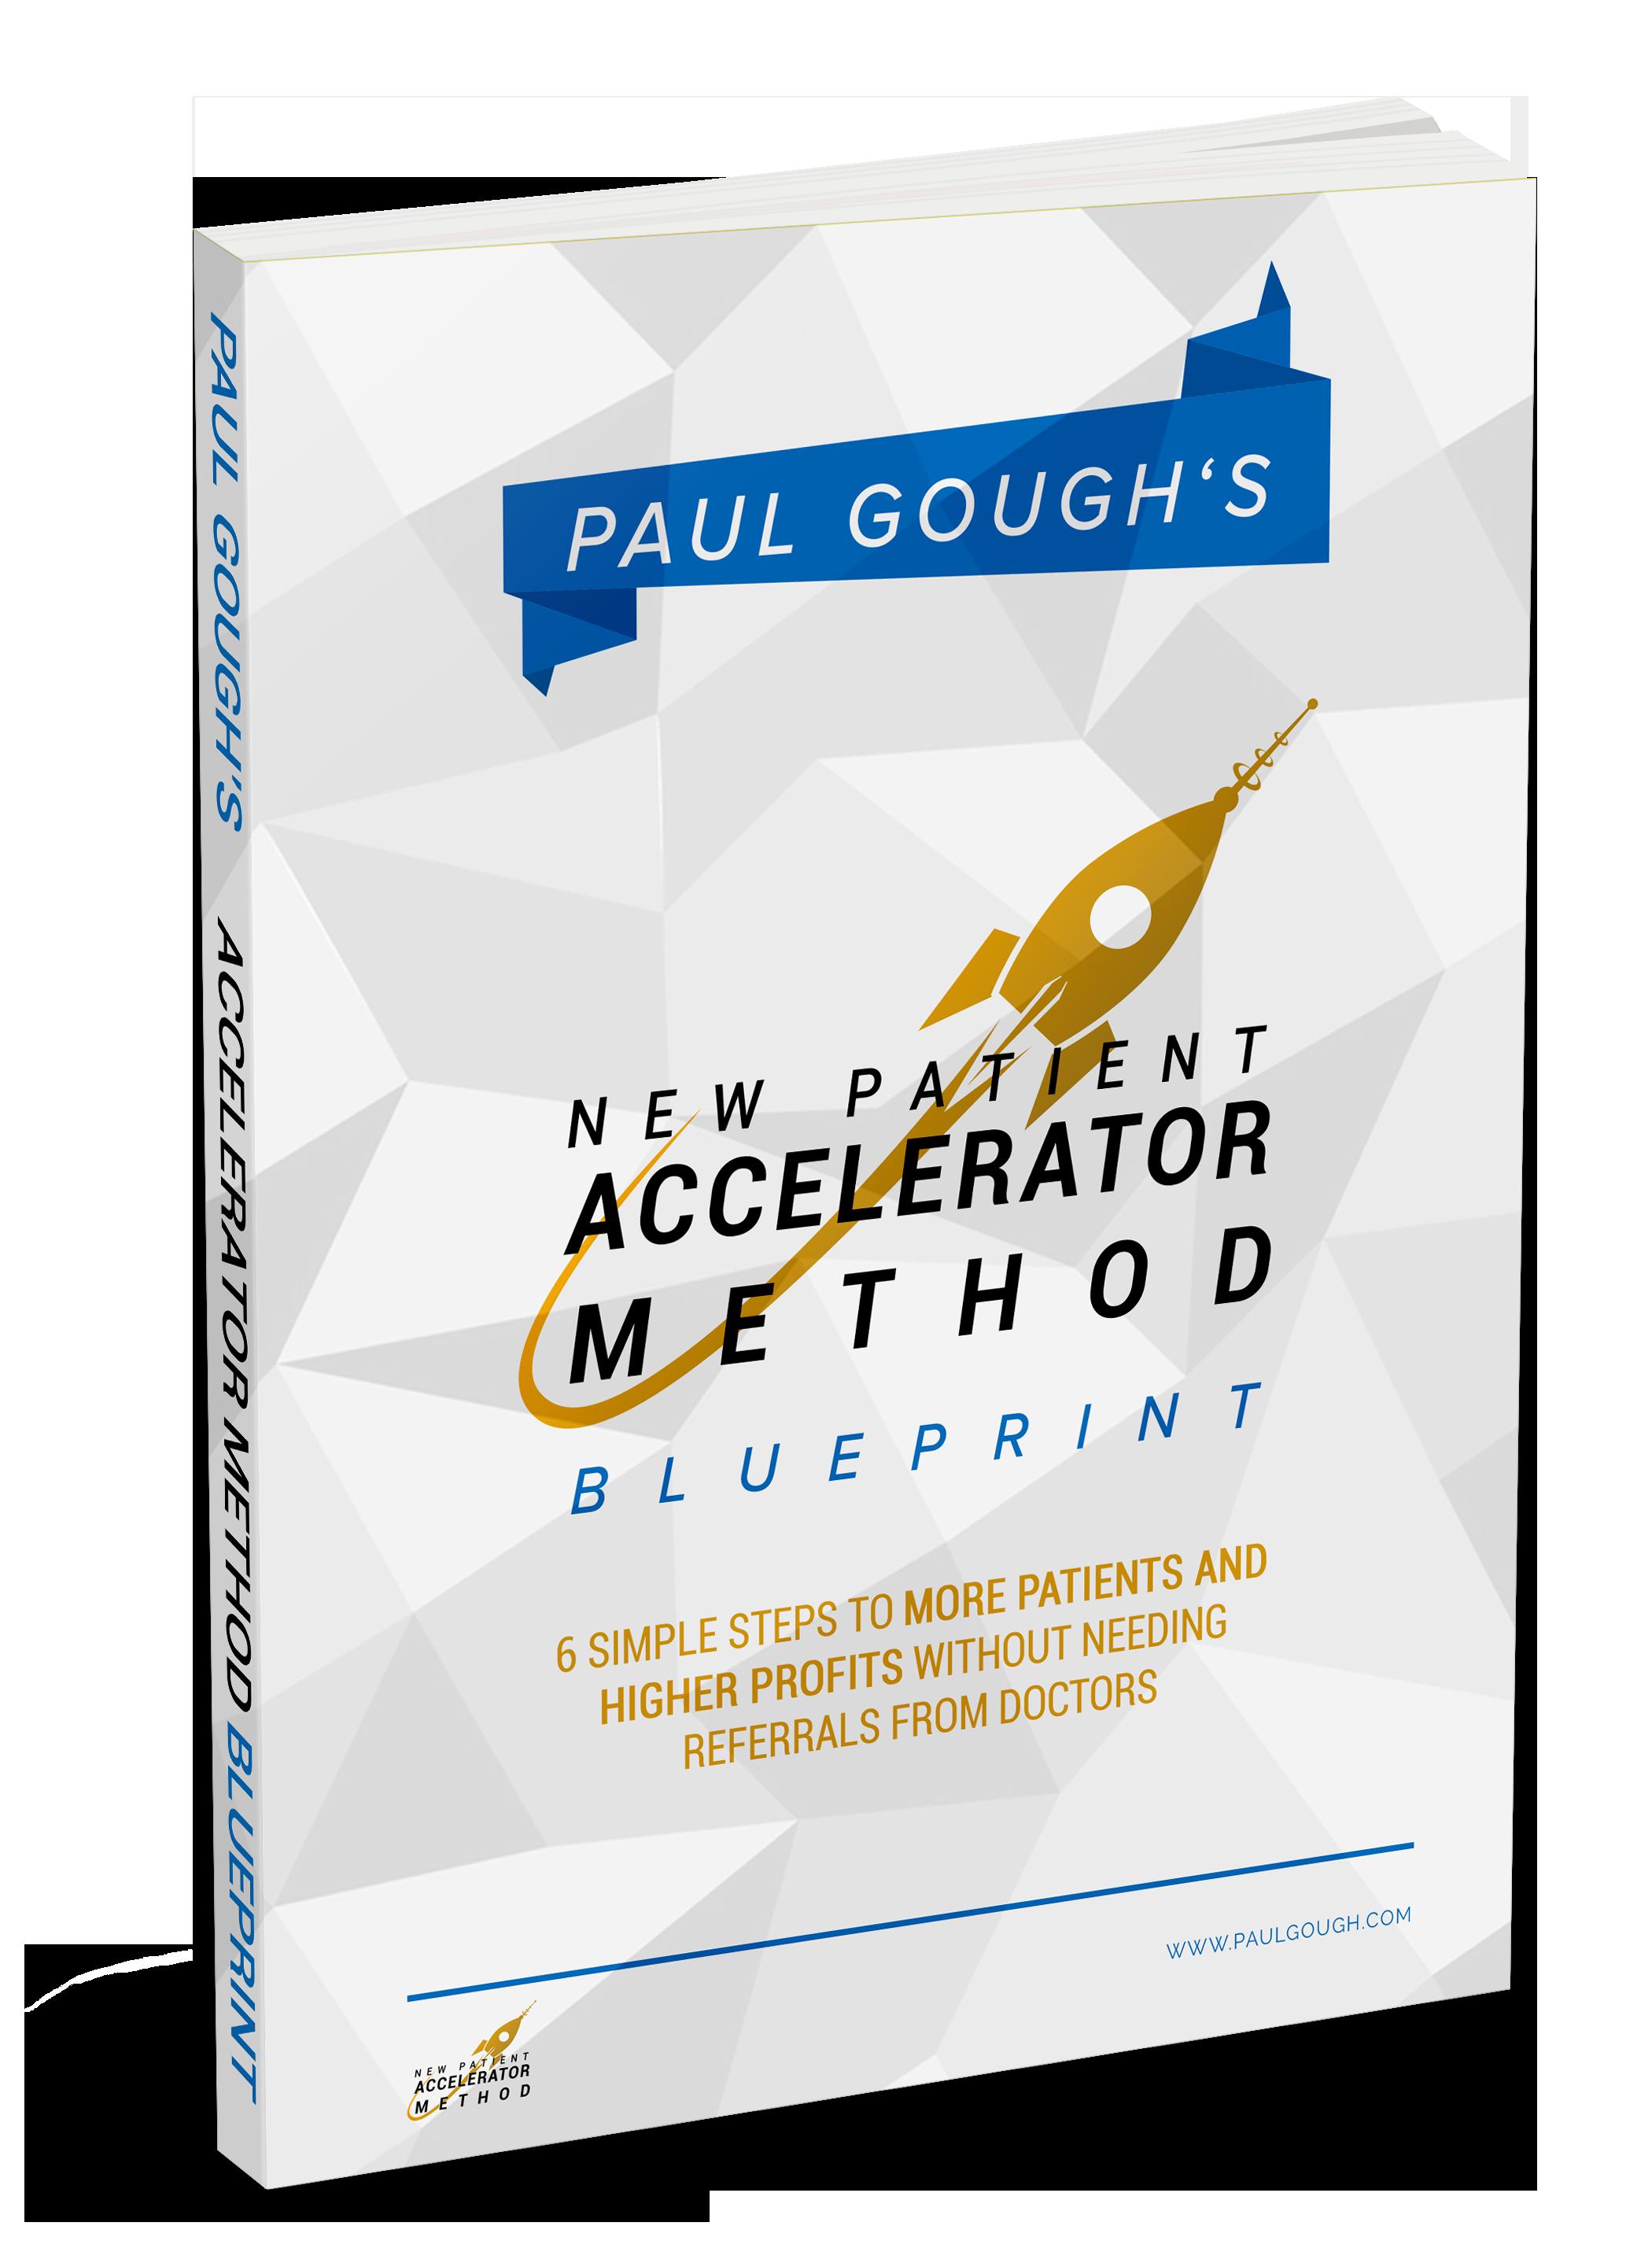 Blueprint accelerator method paul gough 3d lebauer consulting blueprint accelerator method paul gough 3d malvernweather Image collections